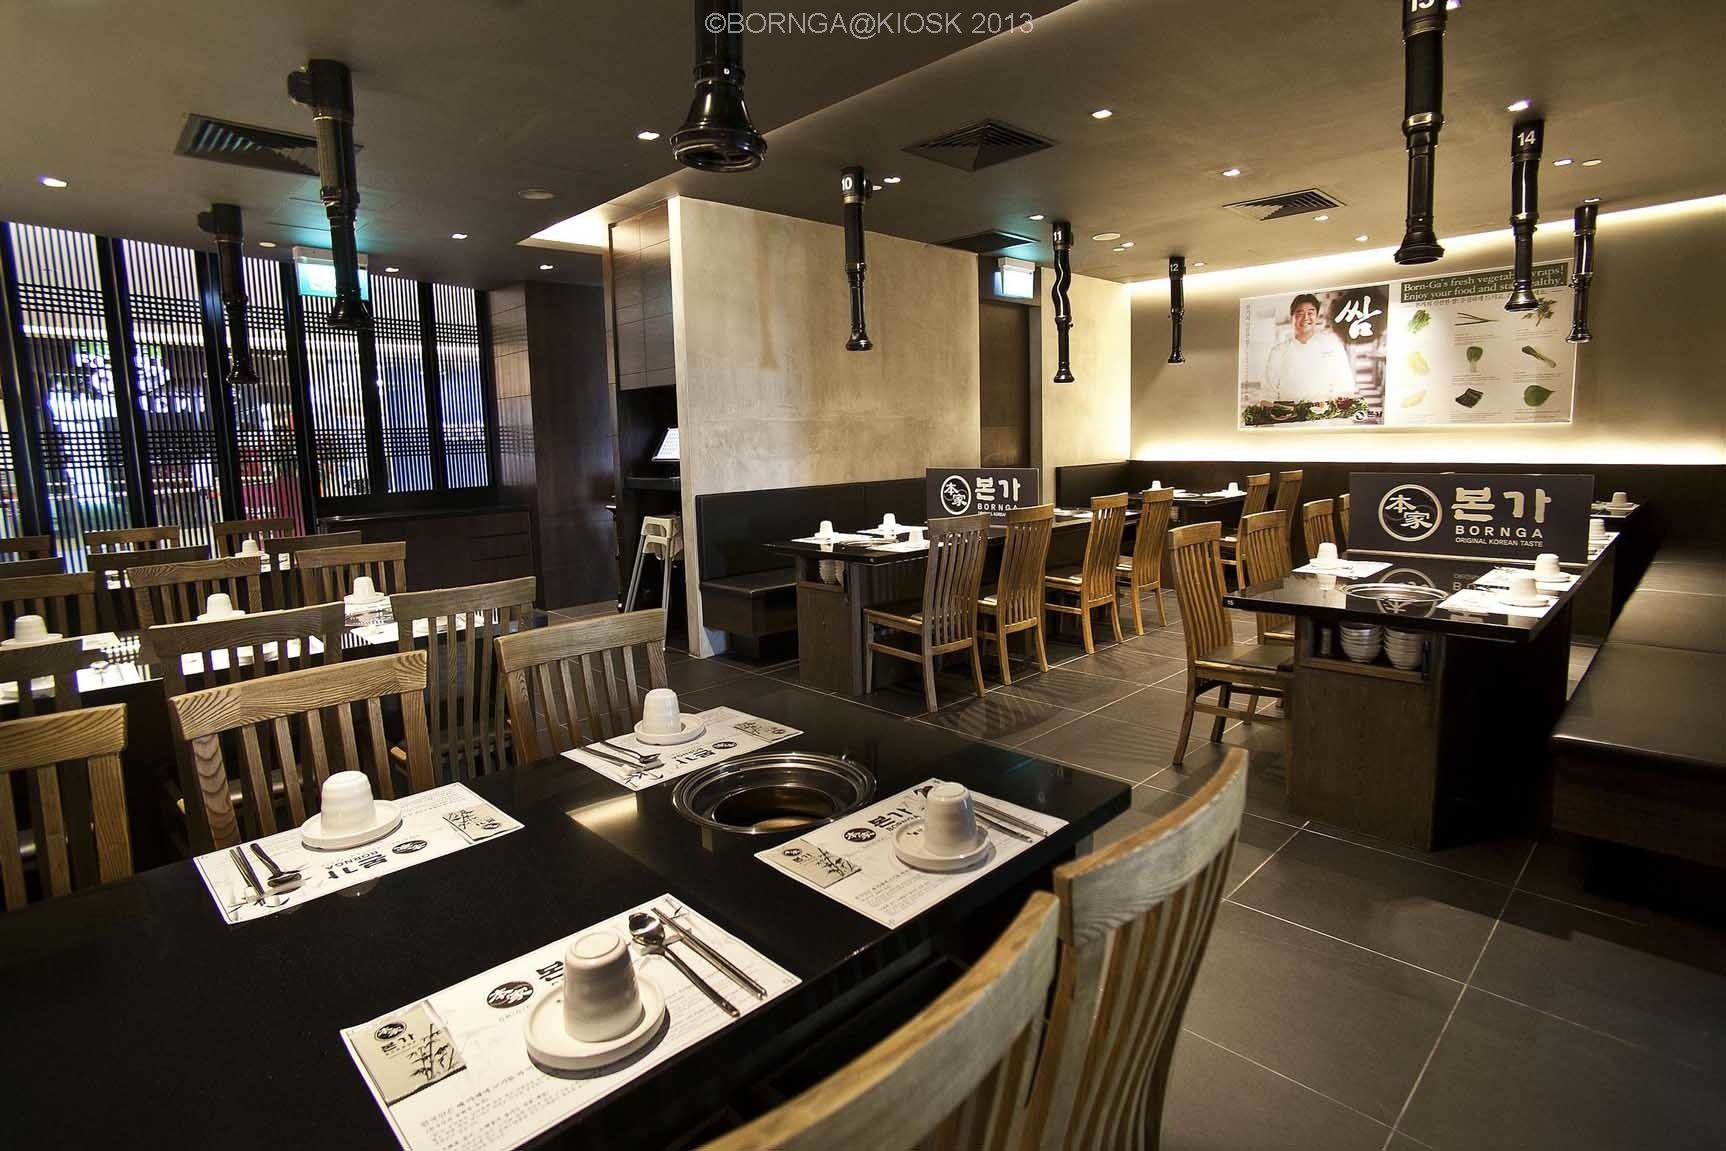 Bornga vivocity bornga is the largest chain of korean bbq restaurants globally with close to